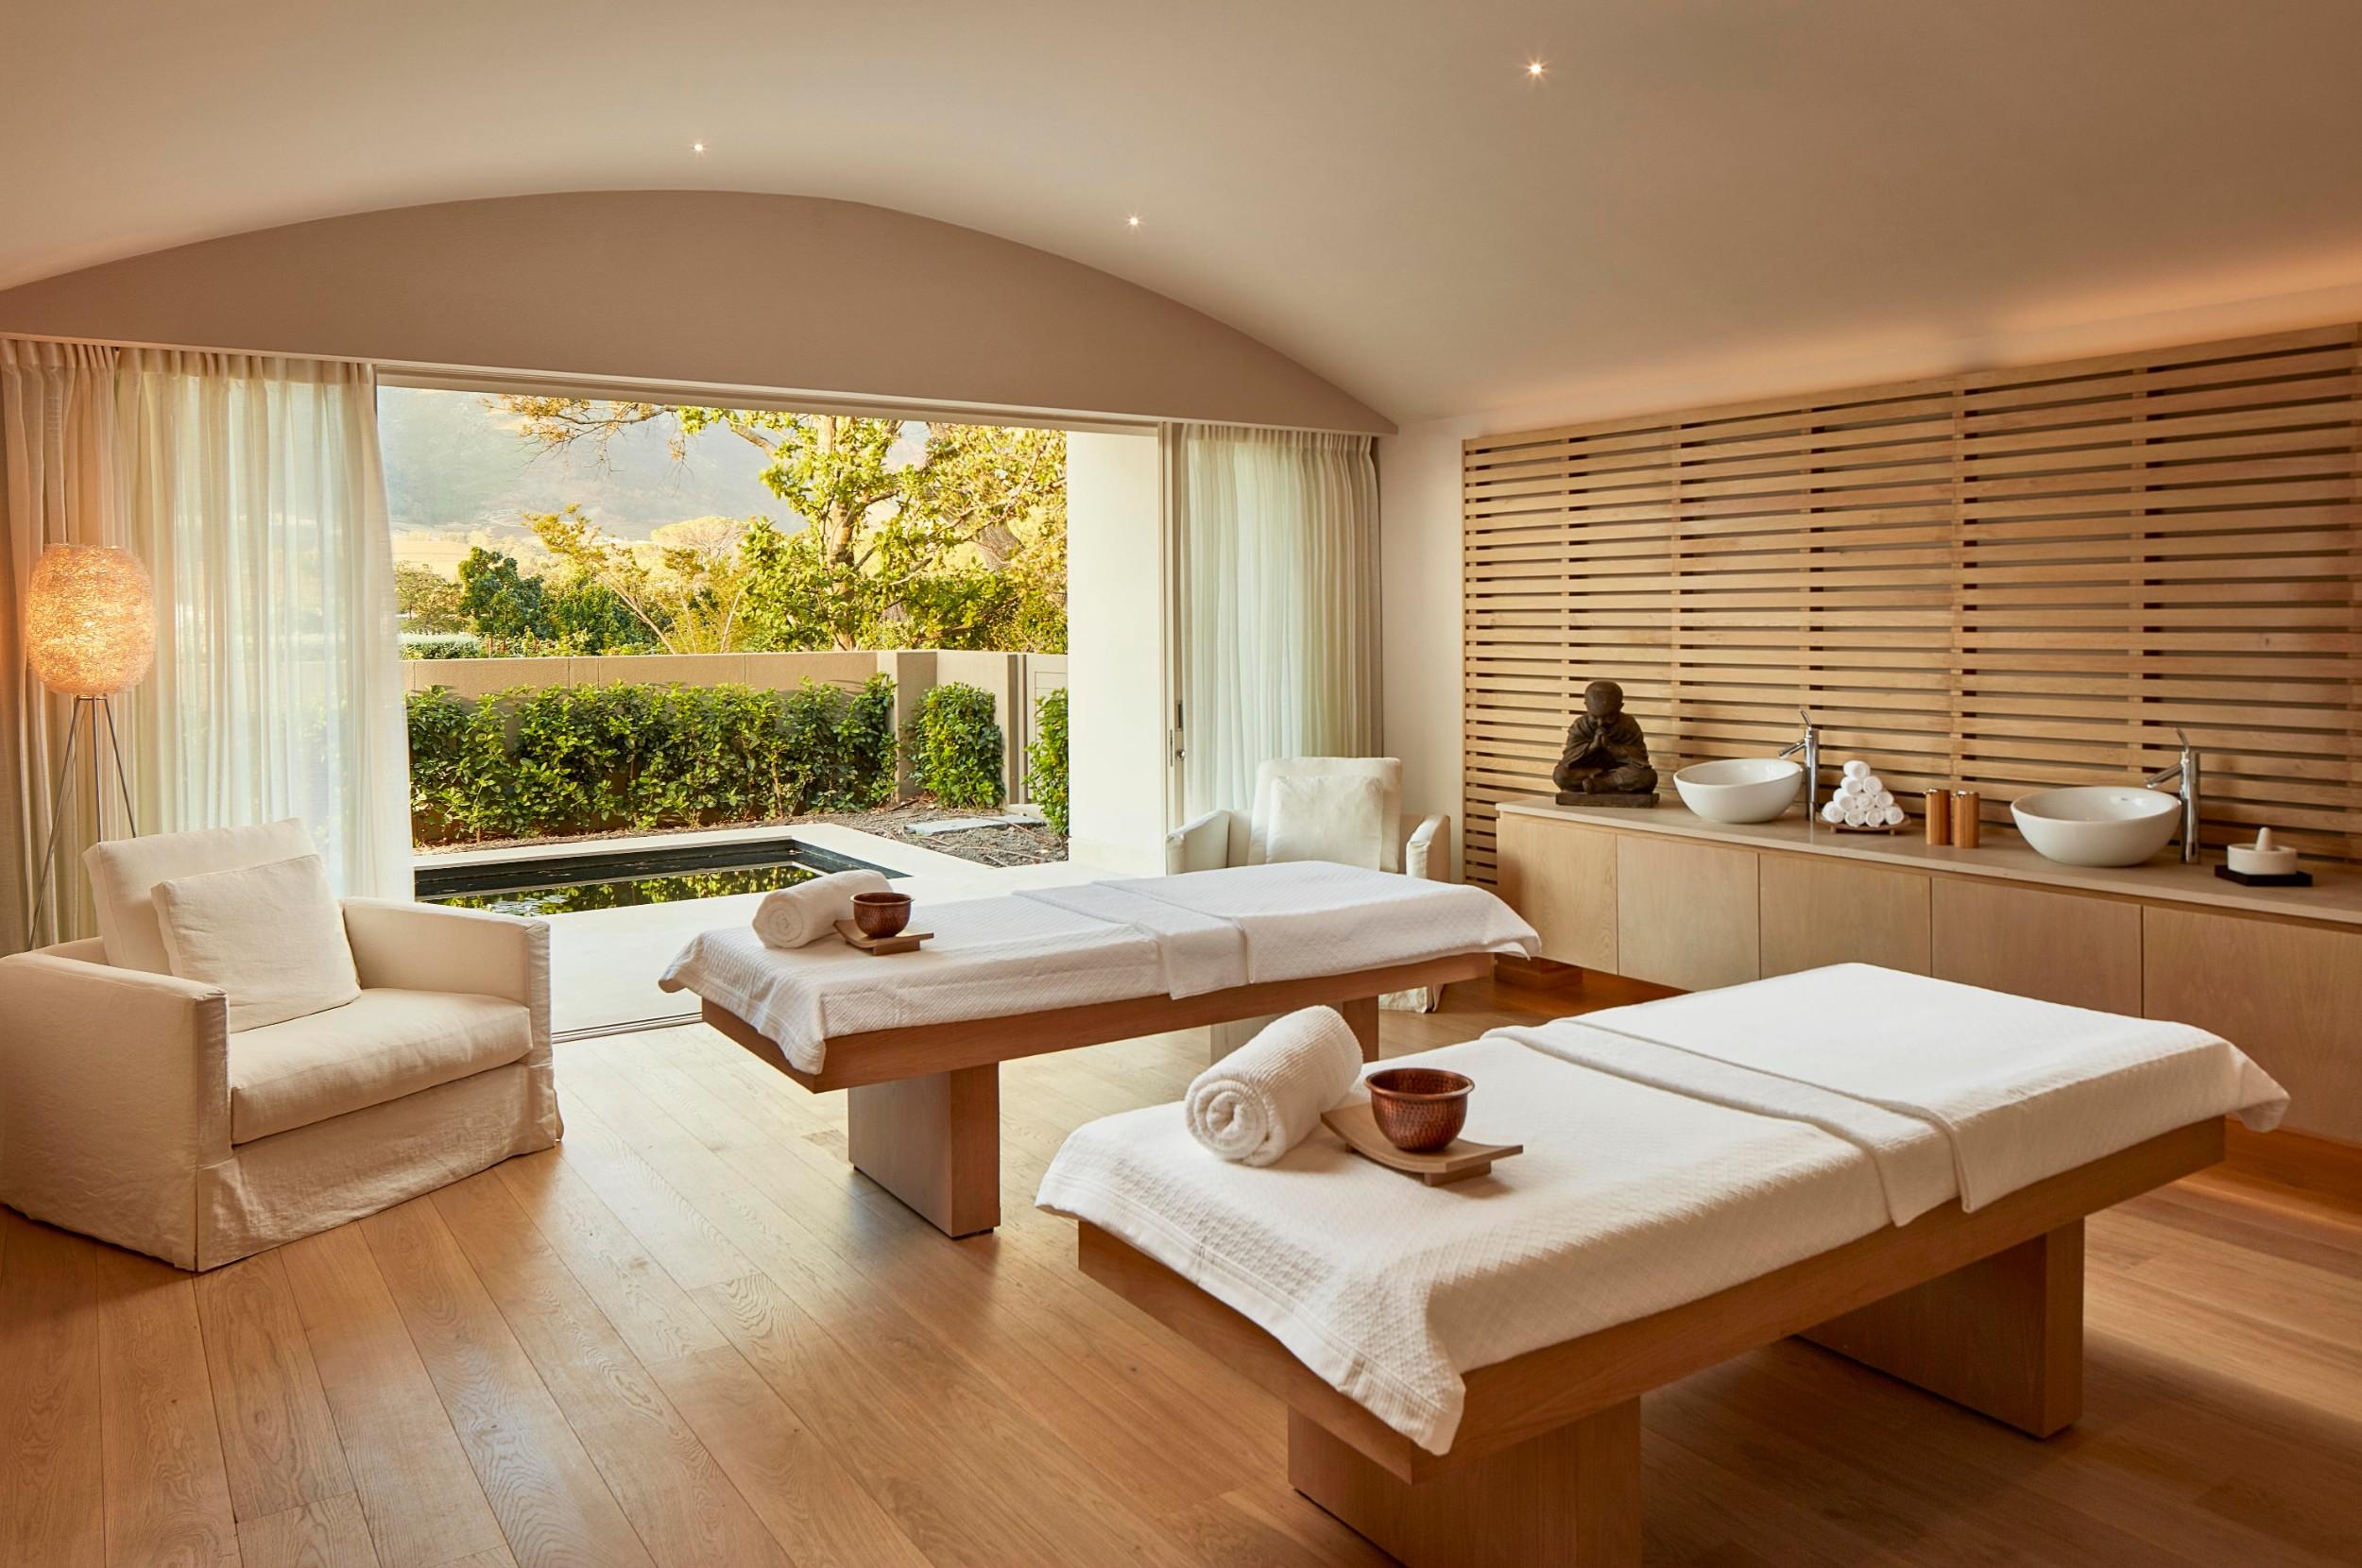 leeu_collection_spa_treatment_room_001.jpg